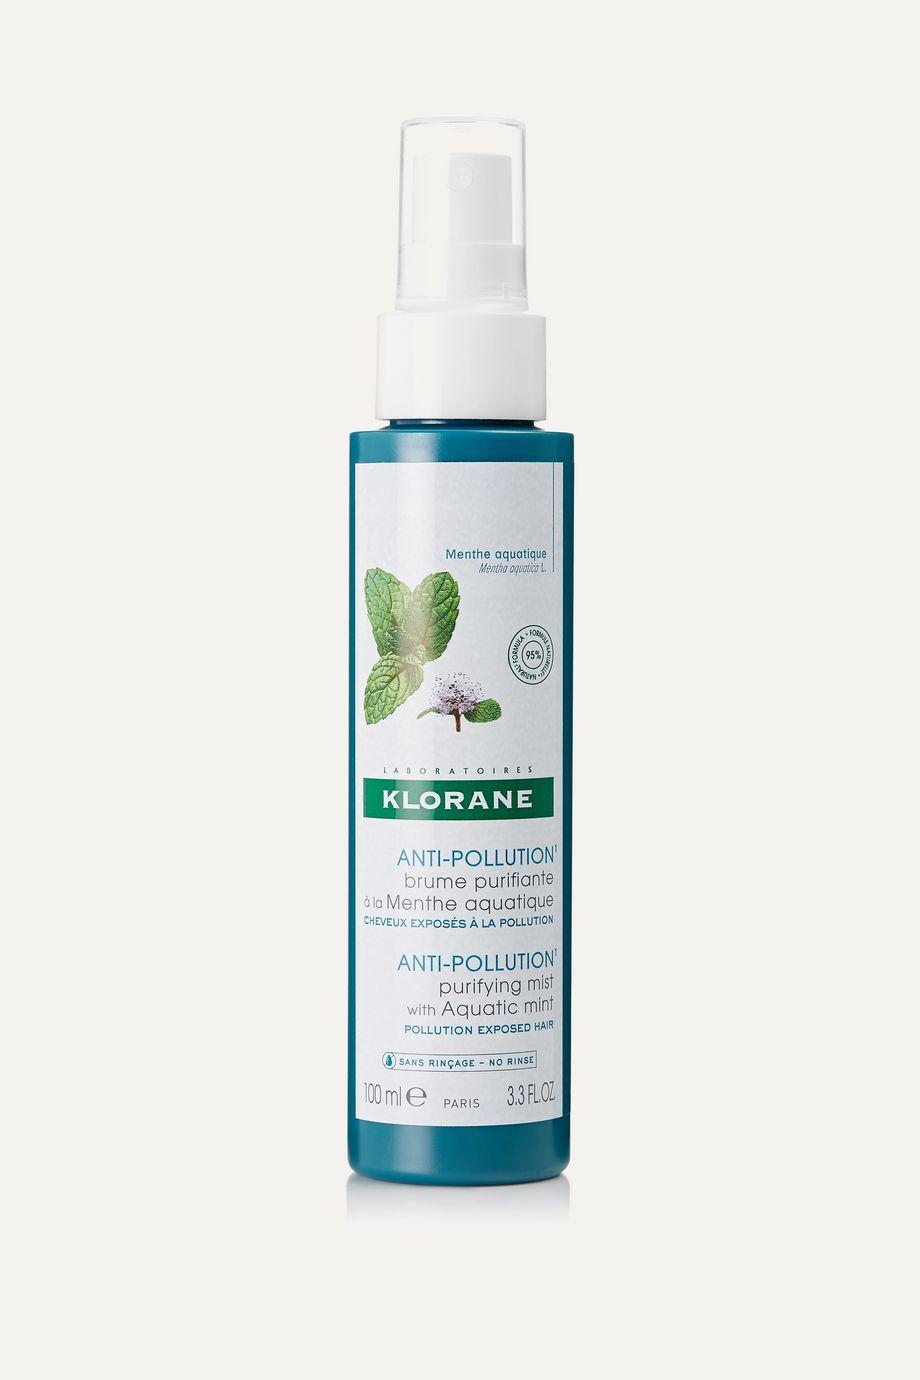 Klorane Anti-Pollution Purifying Mist With Aquatic Mint, 100ml